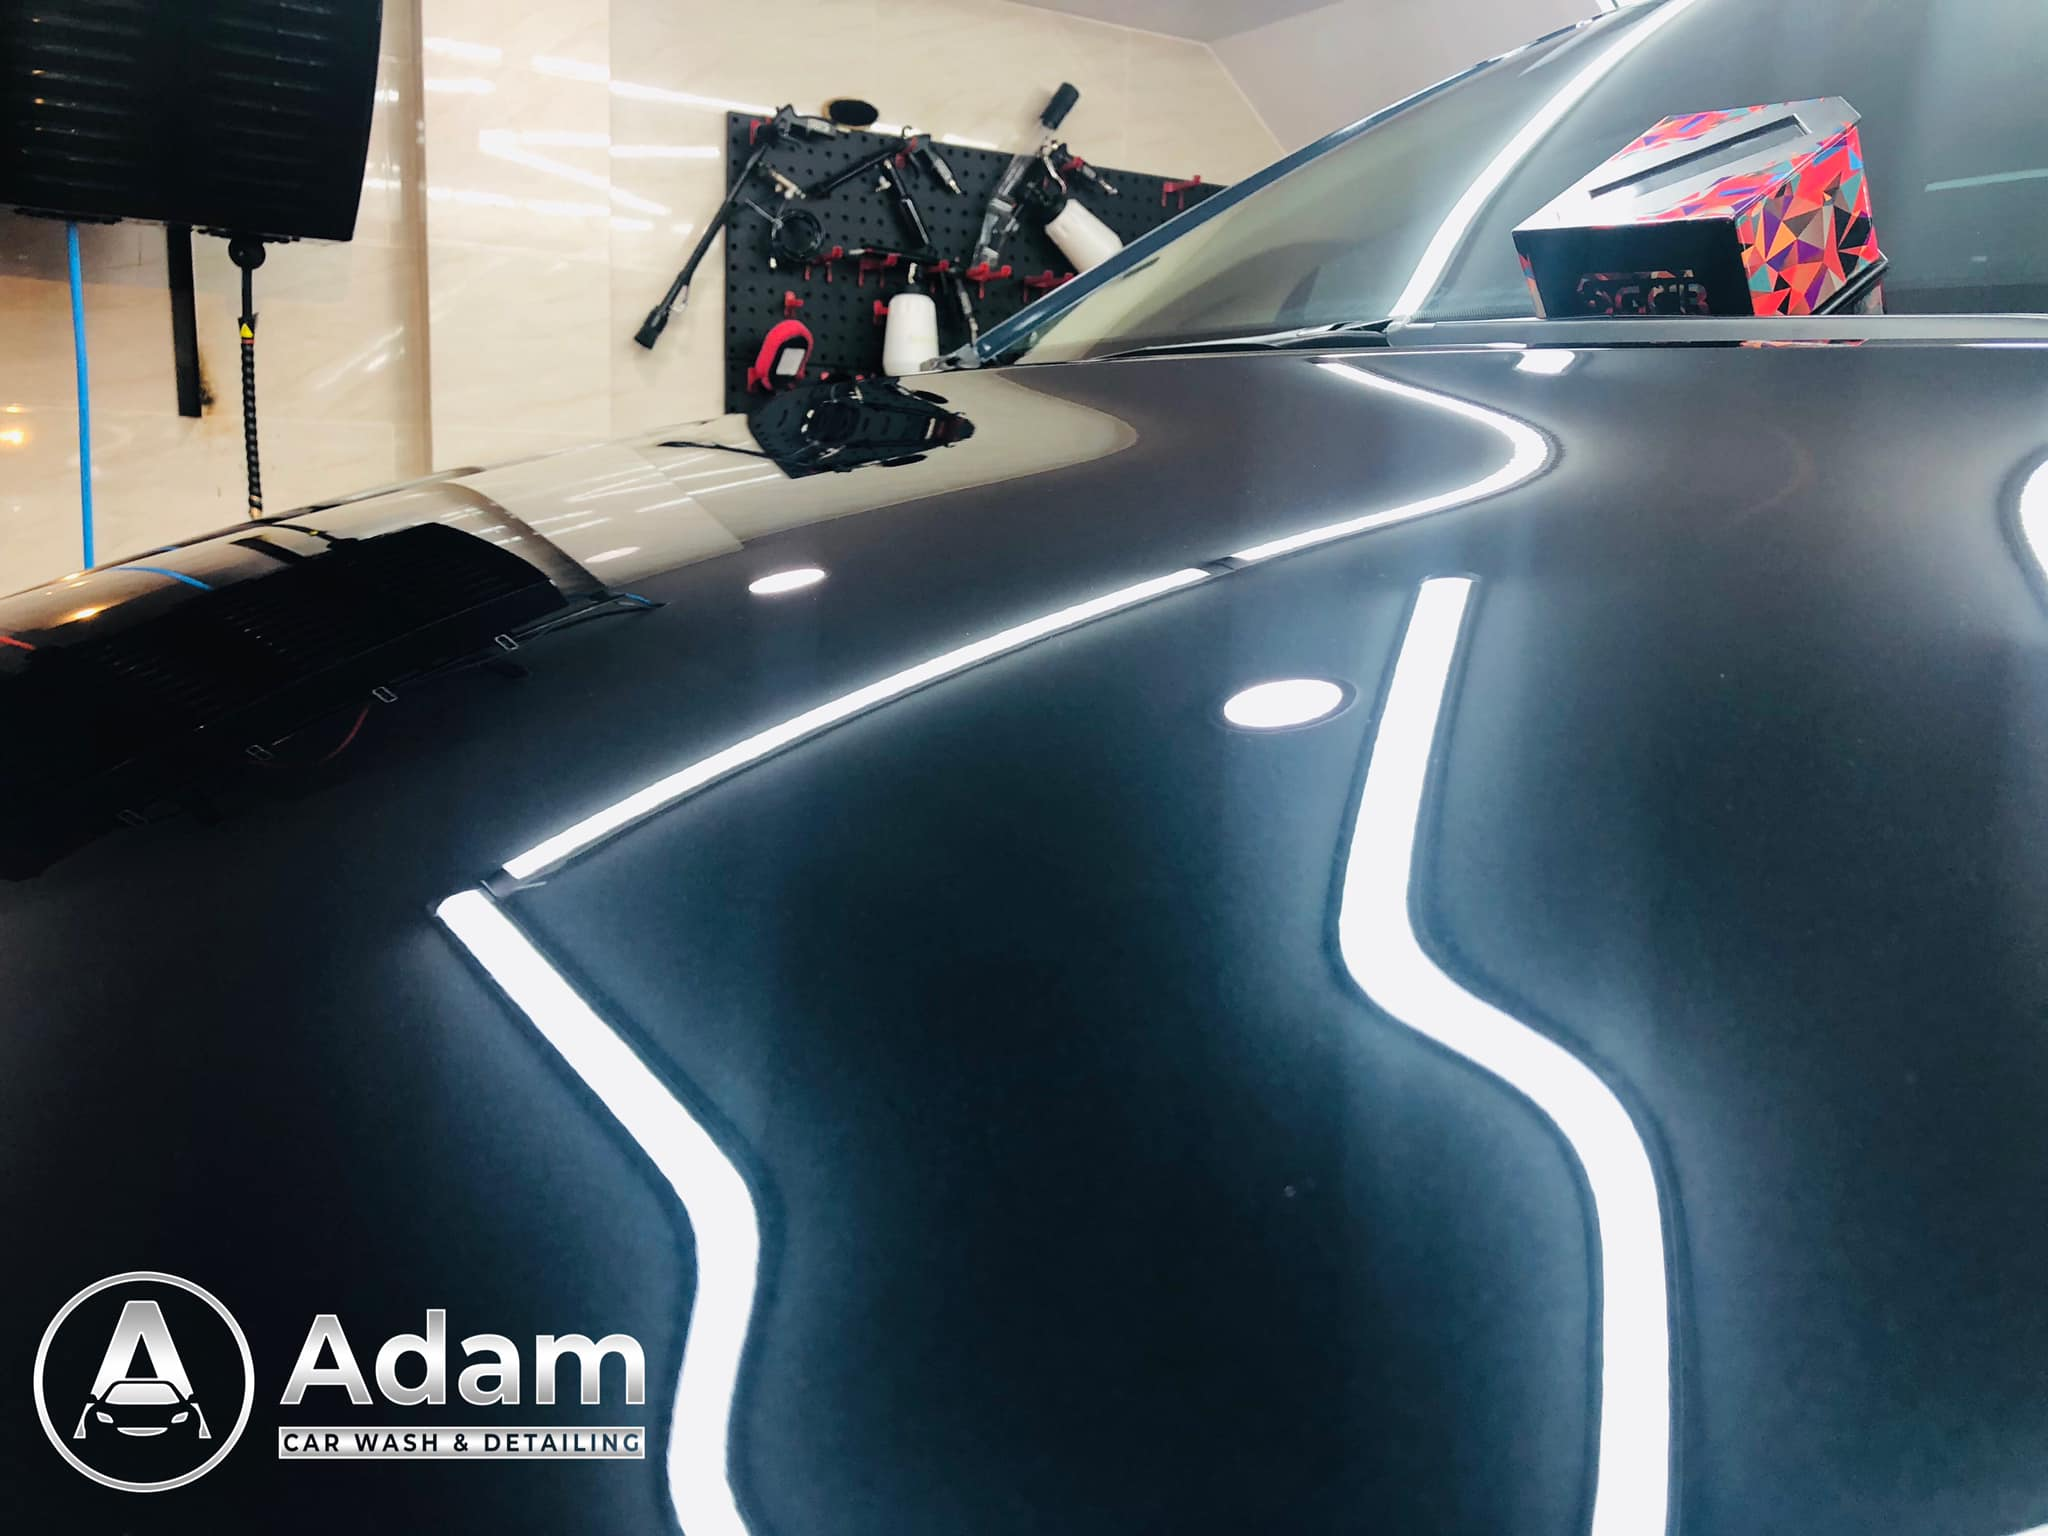 adam-car-wash-detailing-dai-ly-sgcb-khu-vuc-go-vap-3